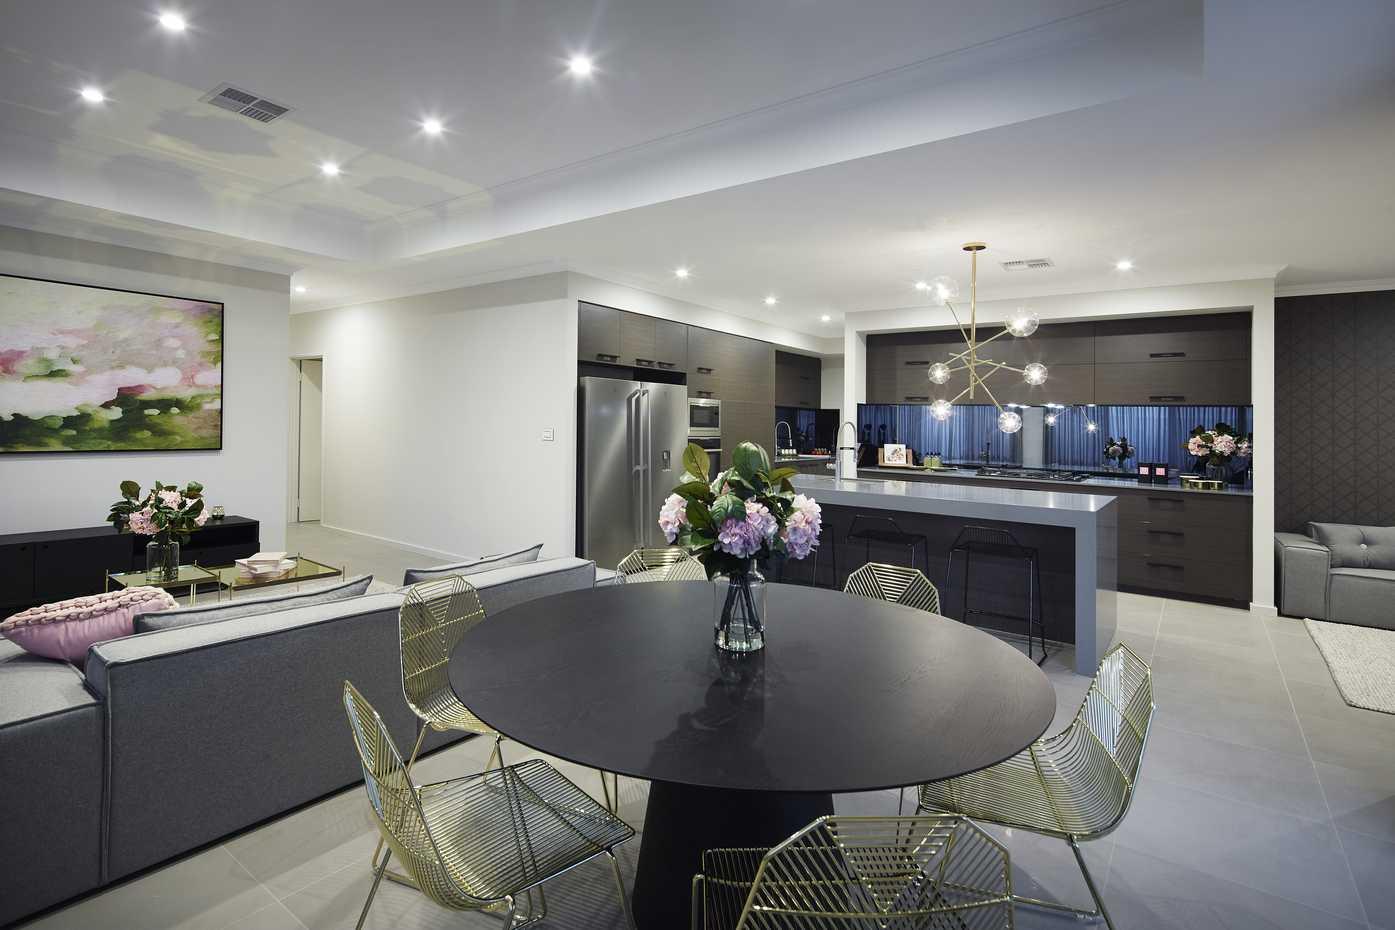 Texas Platinum - Dining Kitchen Family